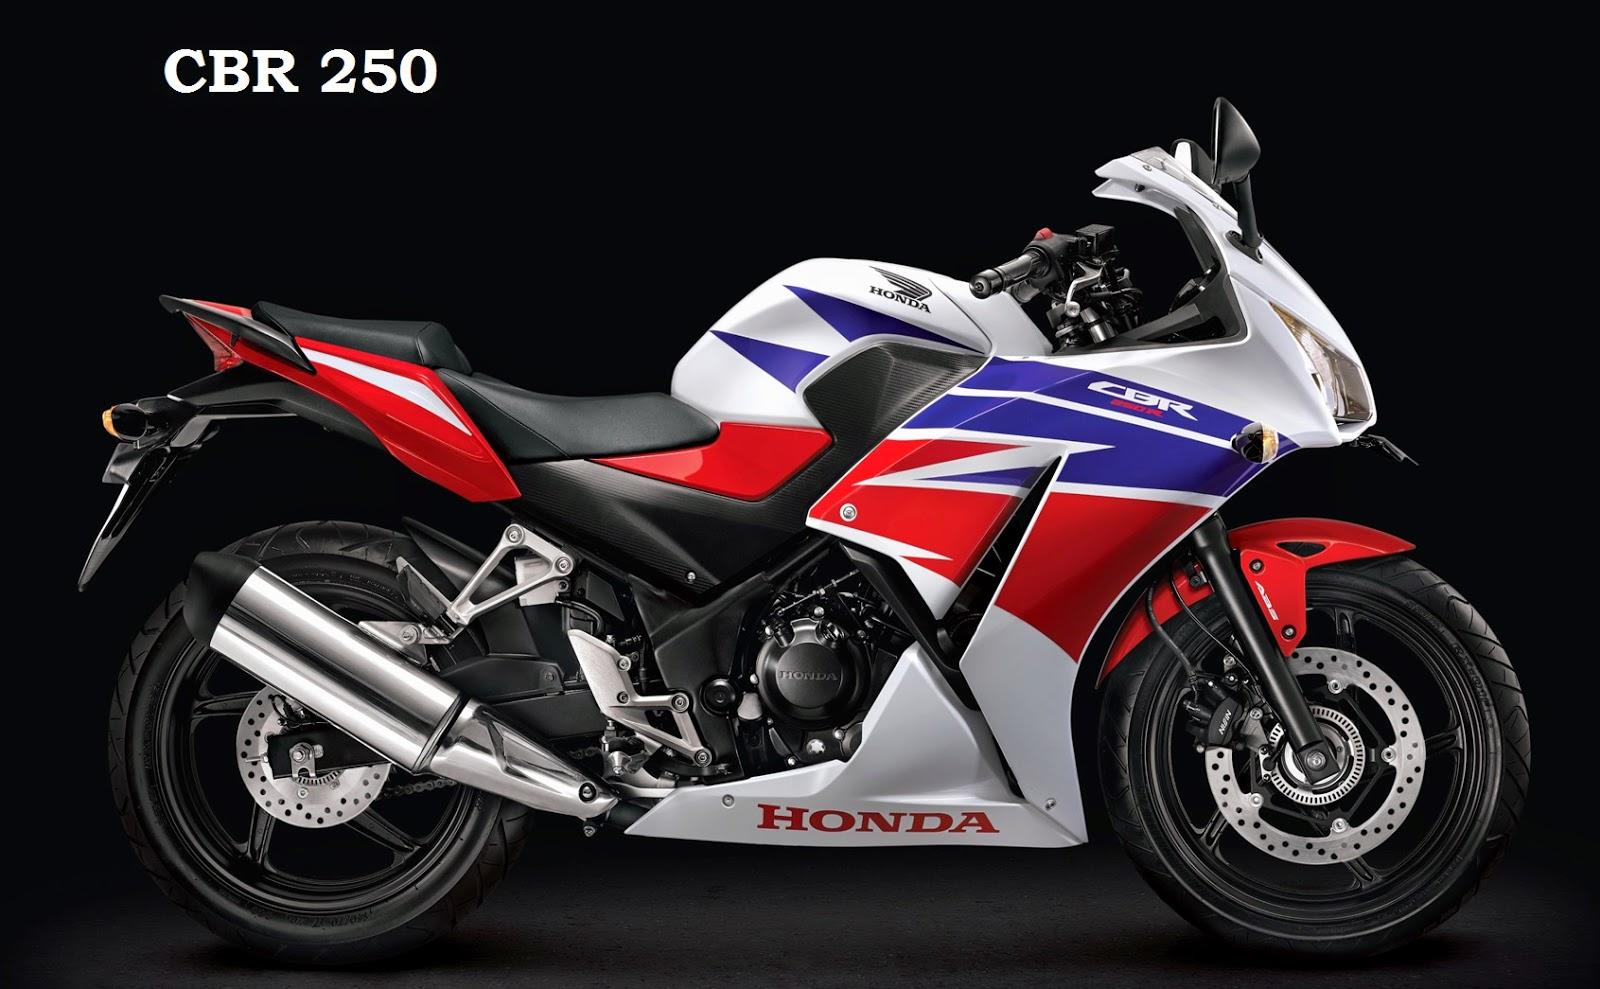 List Harga Motor Honda 2017 Semarang New Vario 125 Esp Cbs Iss Vigor Black Jepara Daftar Resmi Lengkap Bulan Mei 2018 Bengkel Bohay